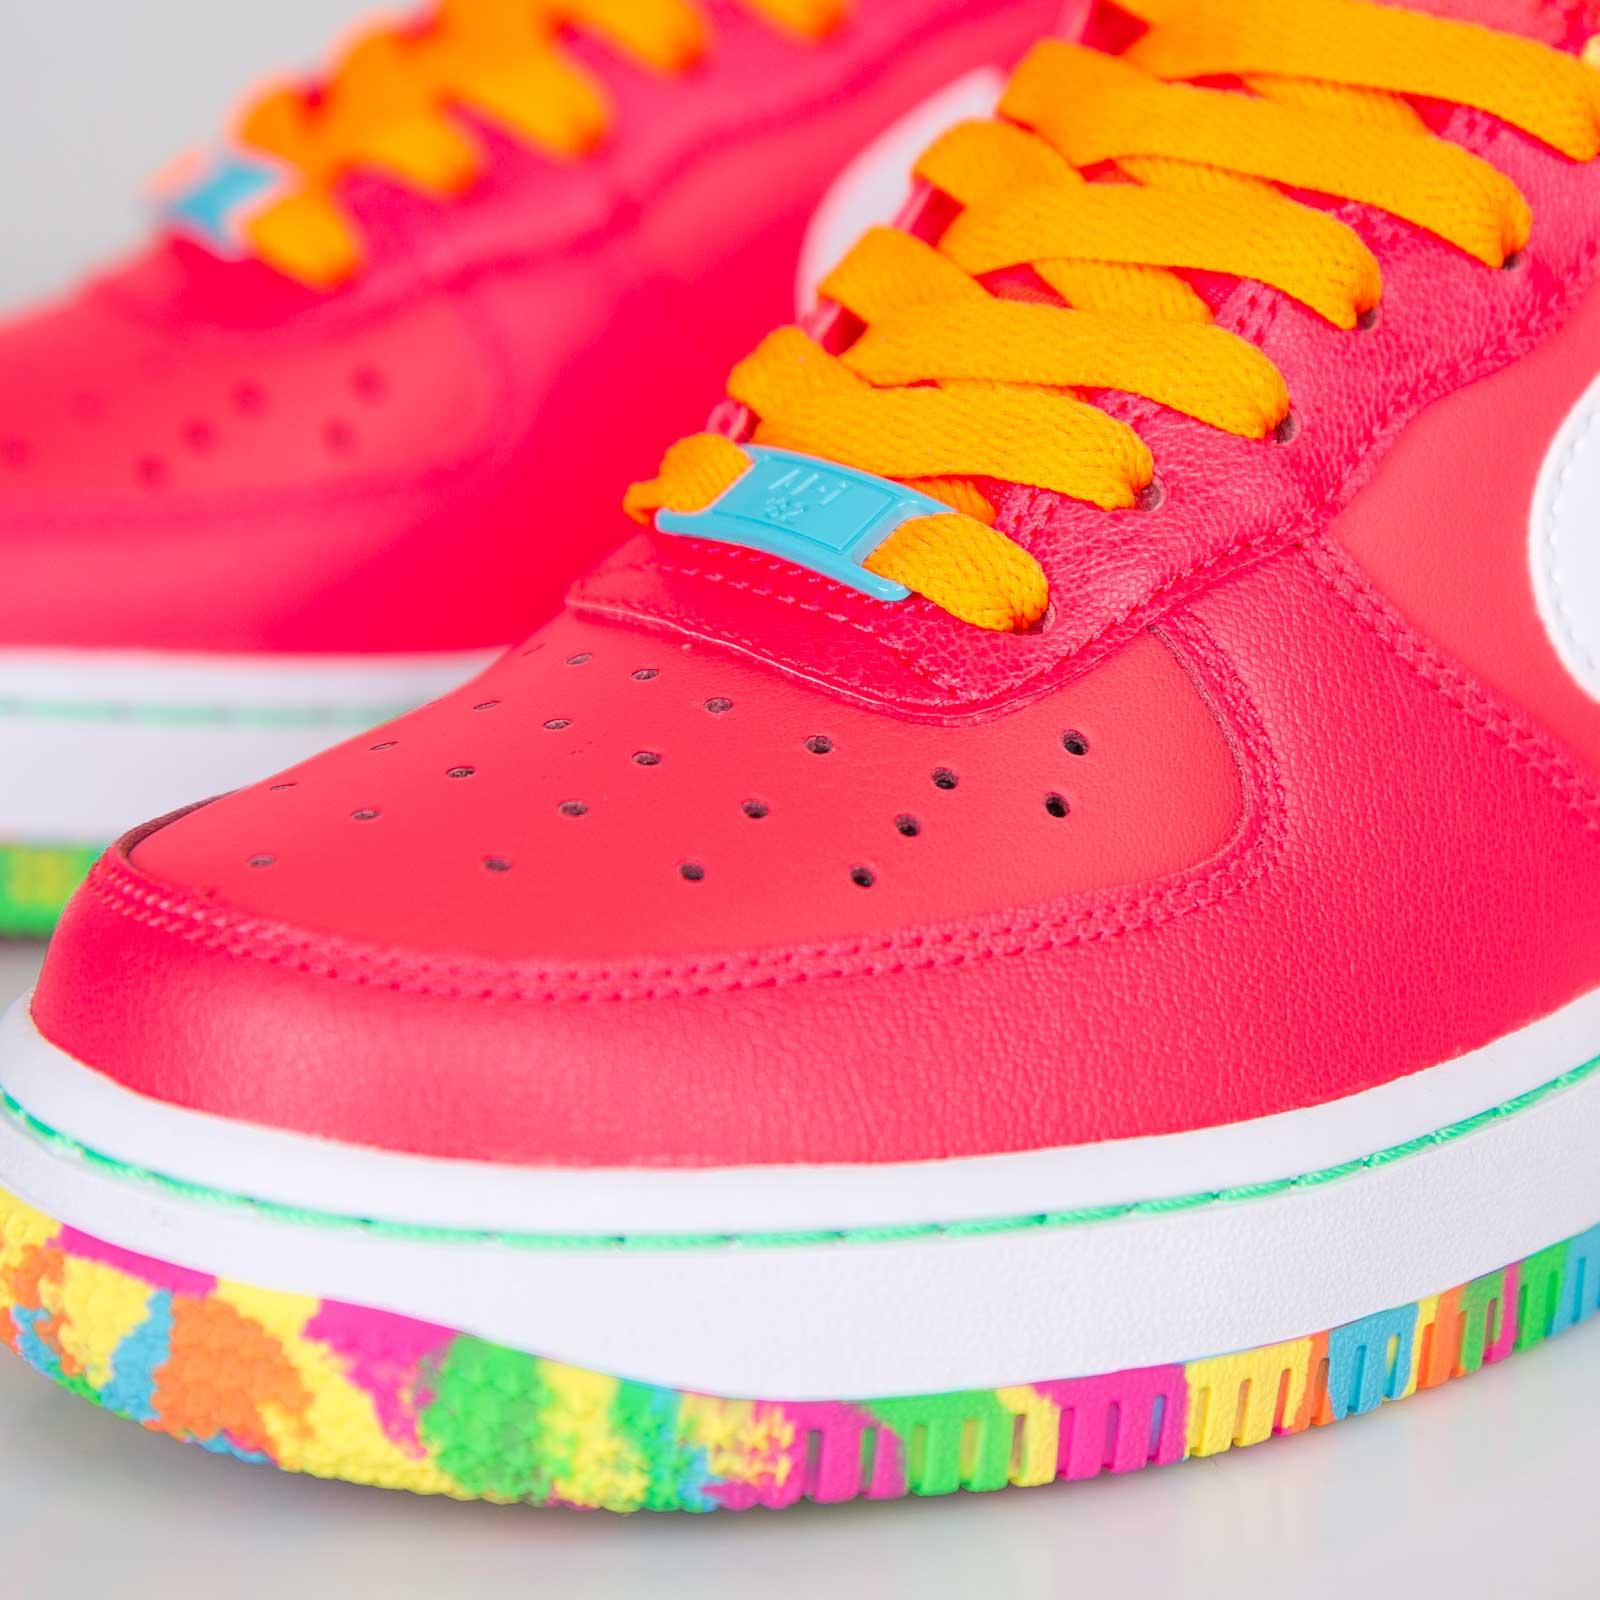 new arrival 79d7d b31df Nike Air Force 1 (GS) - 596728-605 - Sneakersnstuff | sneakers & streetwear  online since 1999